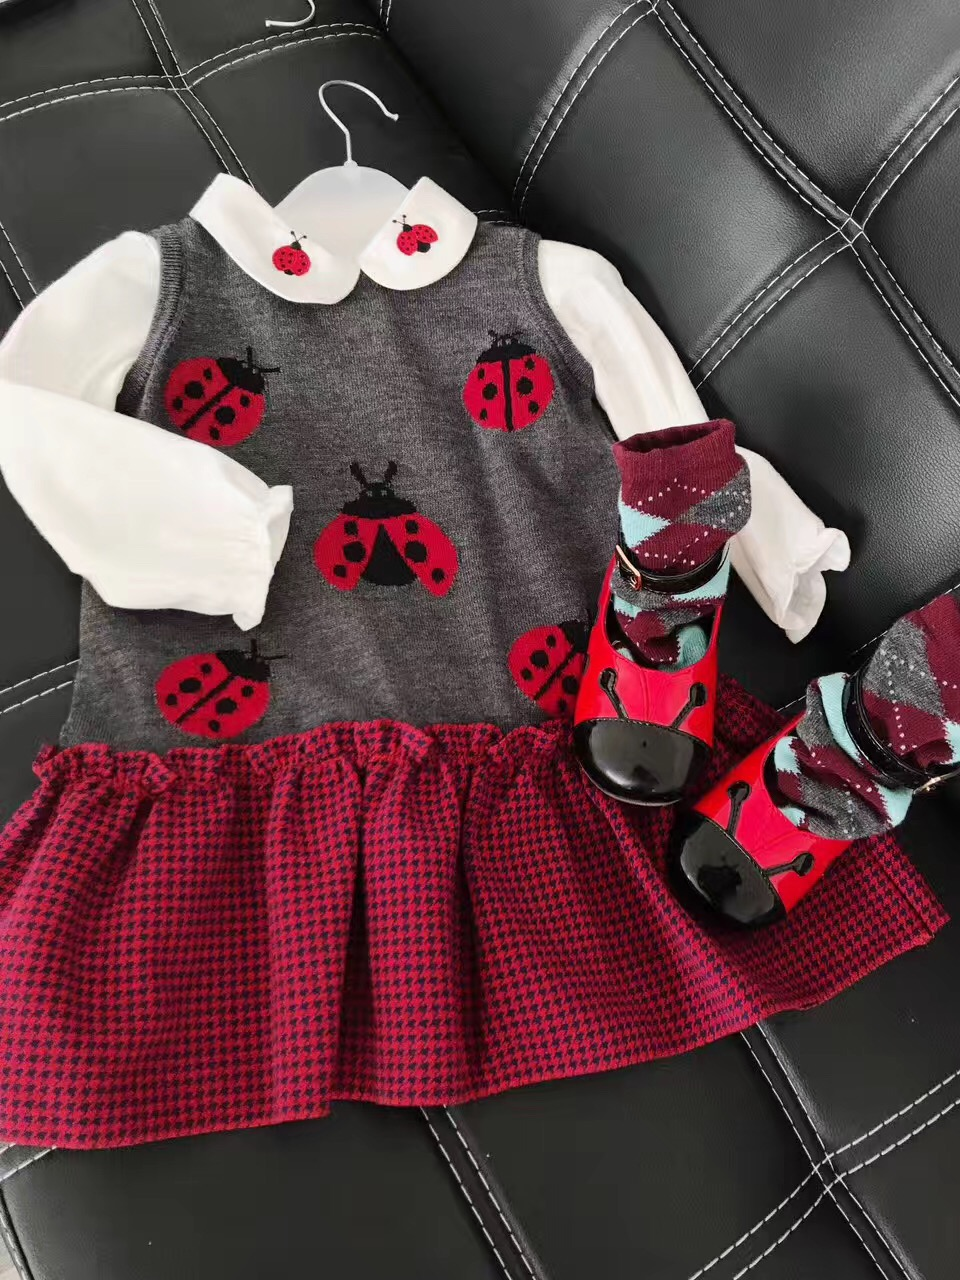 2017 New Design Girls Dress Vestido Infantil Ladybug Knitted Sleeveless Autumn Girls Dress Fashion Kids Dresses For Girls вечернее платье mermaid dress vestido noiva 2015 w006 elie saab evening dress